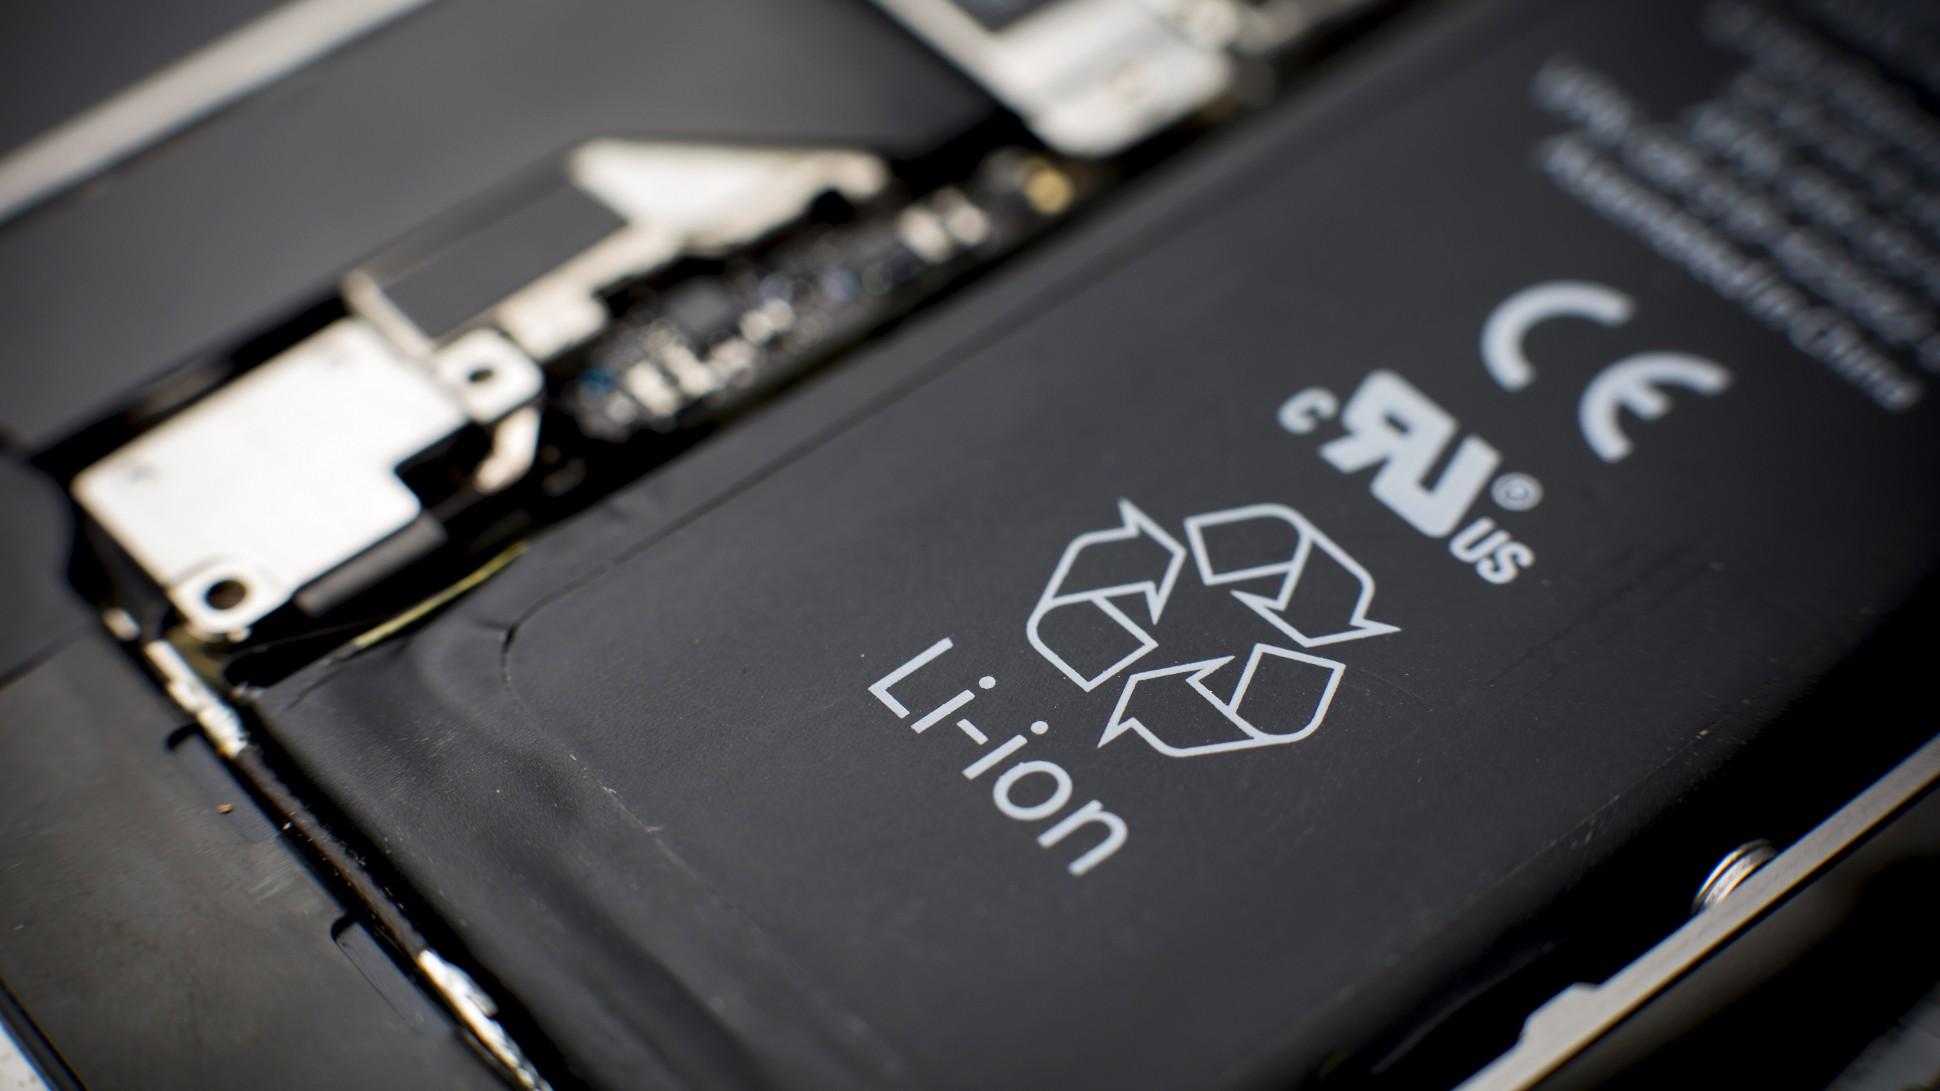 Battery Myths Overcharging Refrigerator Storage